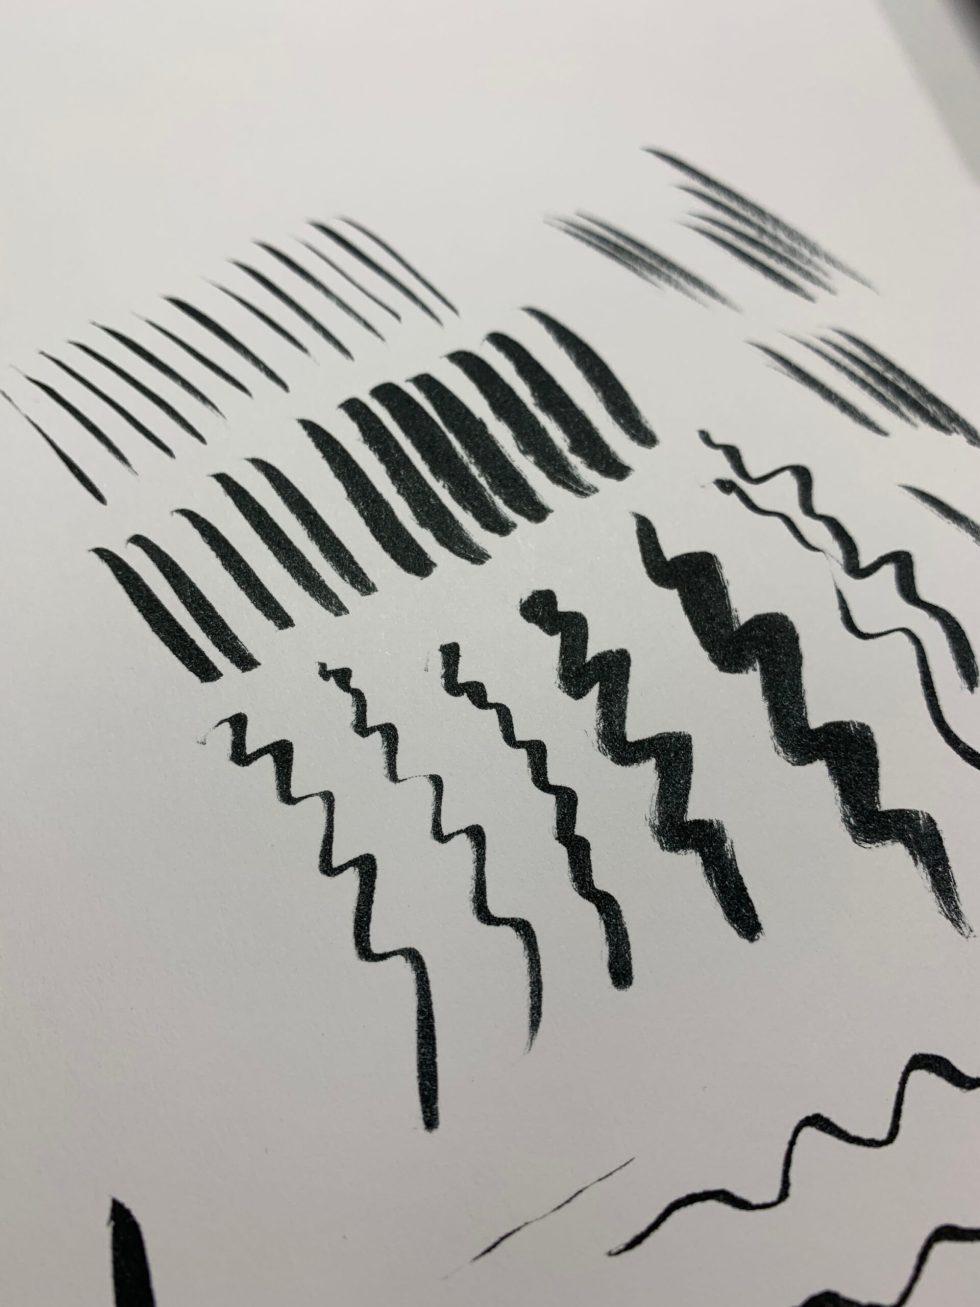 Pentel Fude Brush Image 8